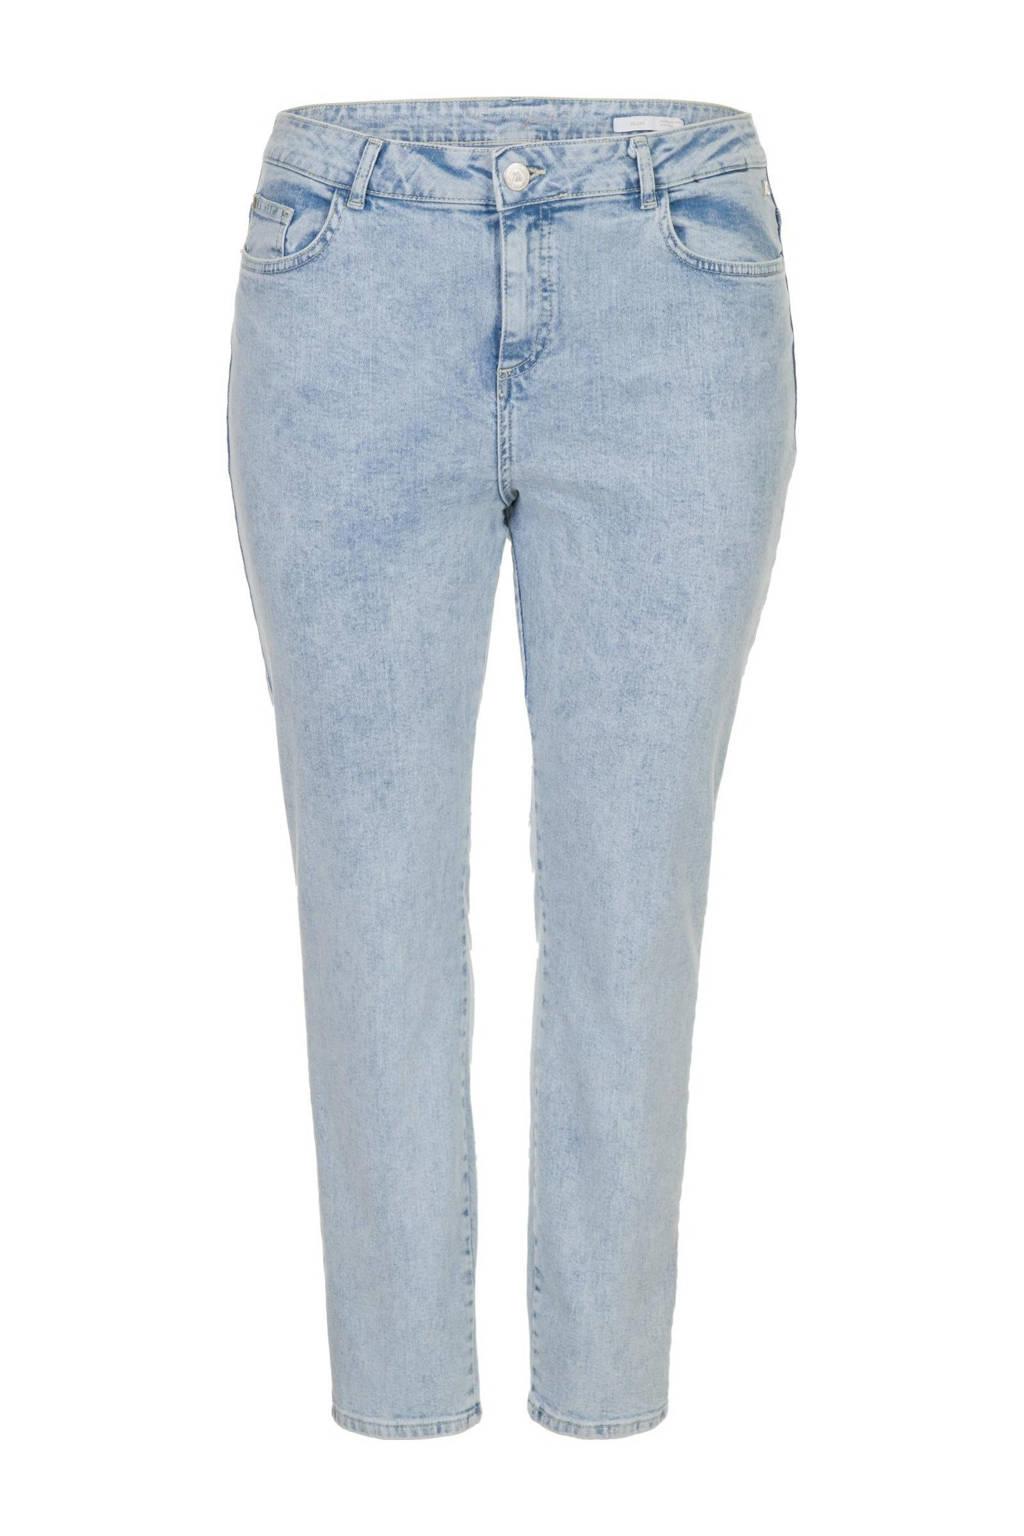 Miss Etam Plus high waist slim fit jeans Jackie 30 inch blauw, Blauw